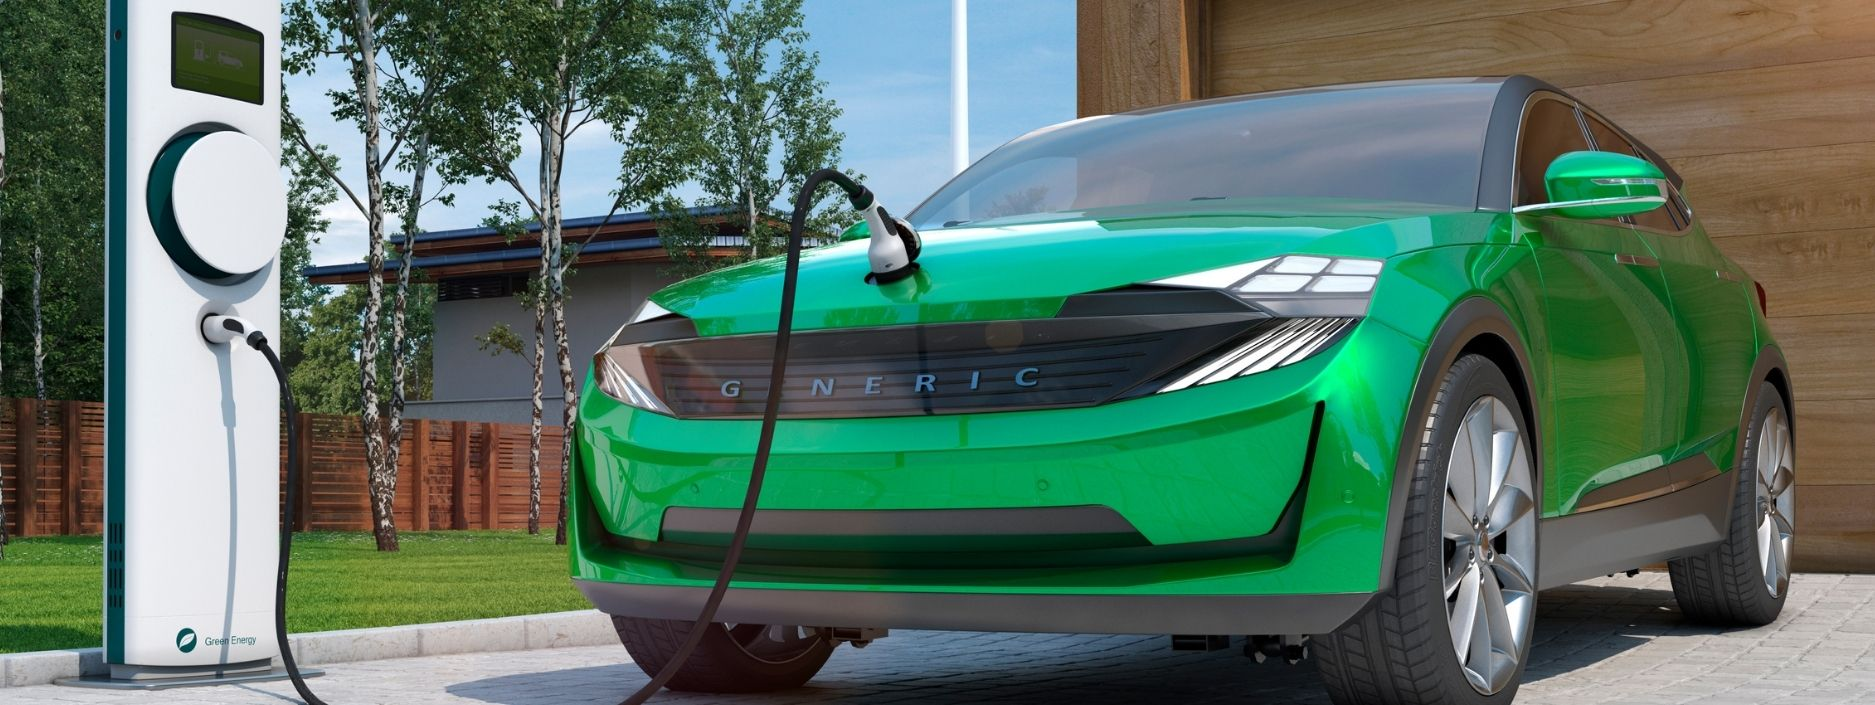 Green energy cars